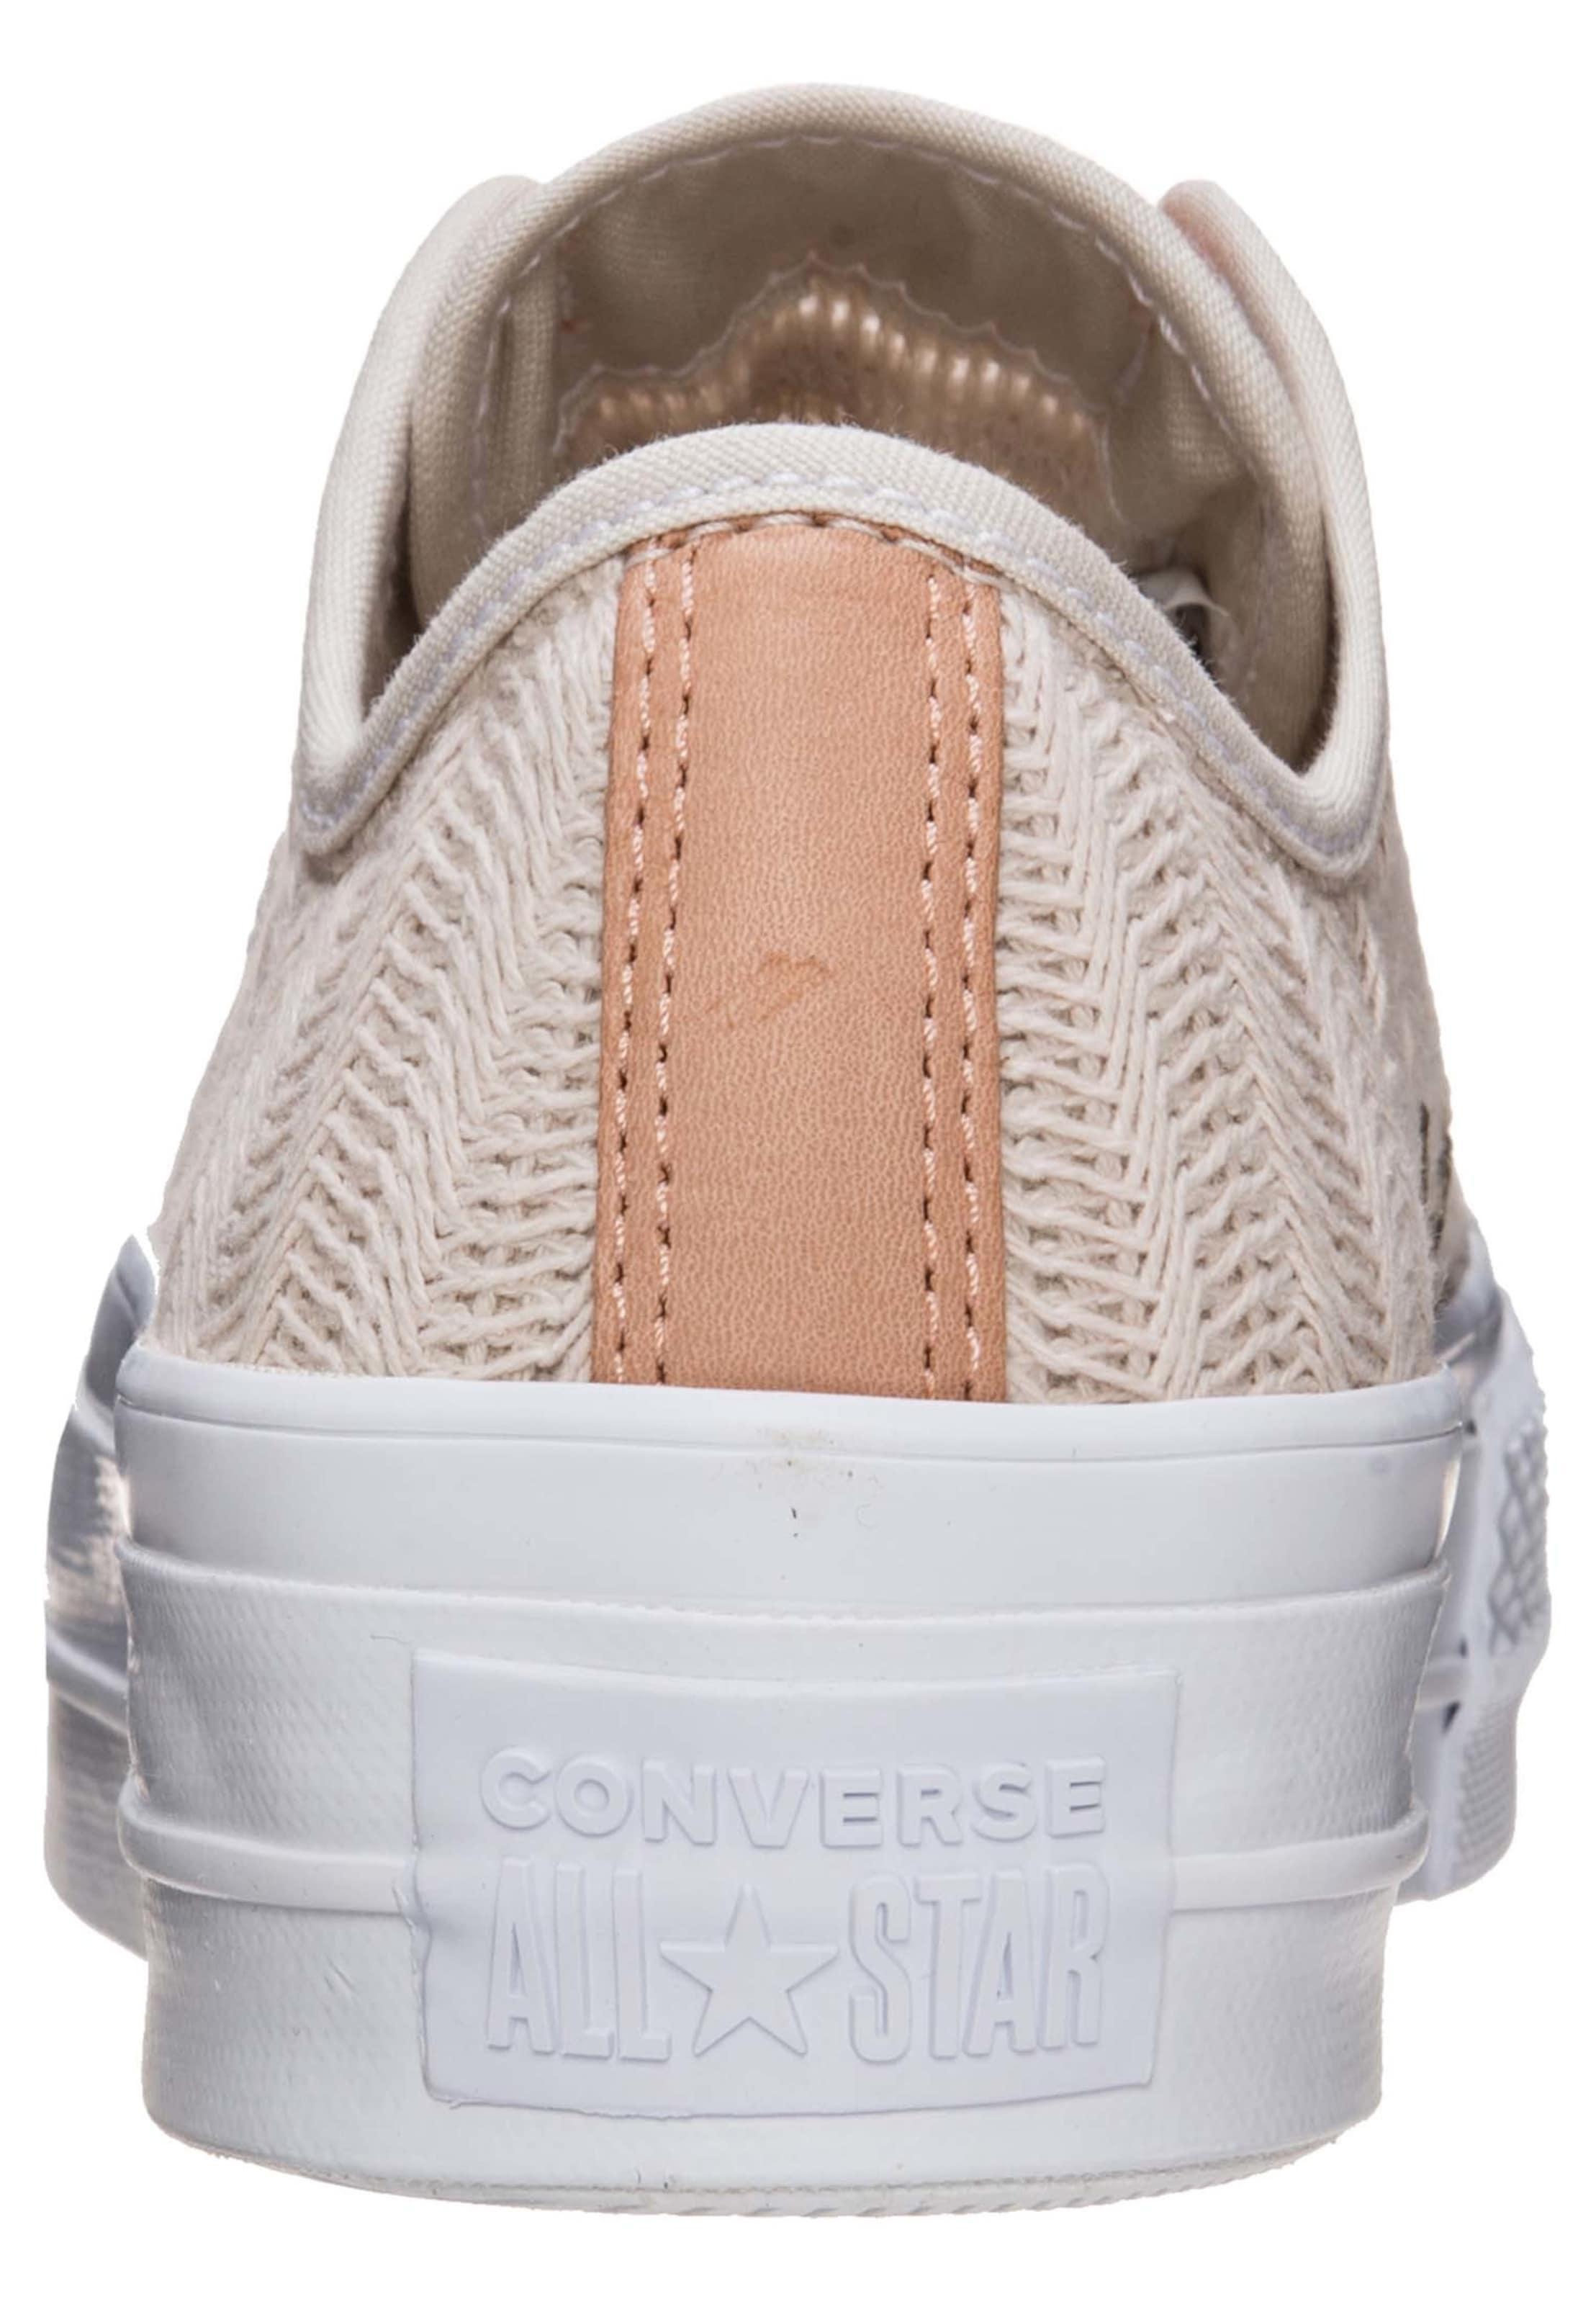 Converse Basses Lift Ox' All Beige 'chuck Star En Baskets Taylor ikuPXZ